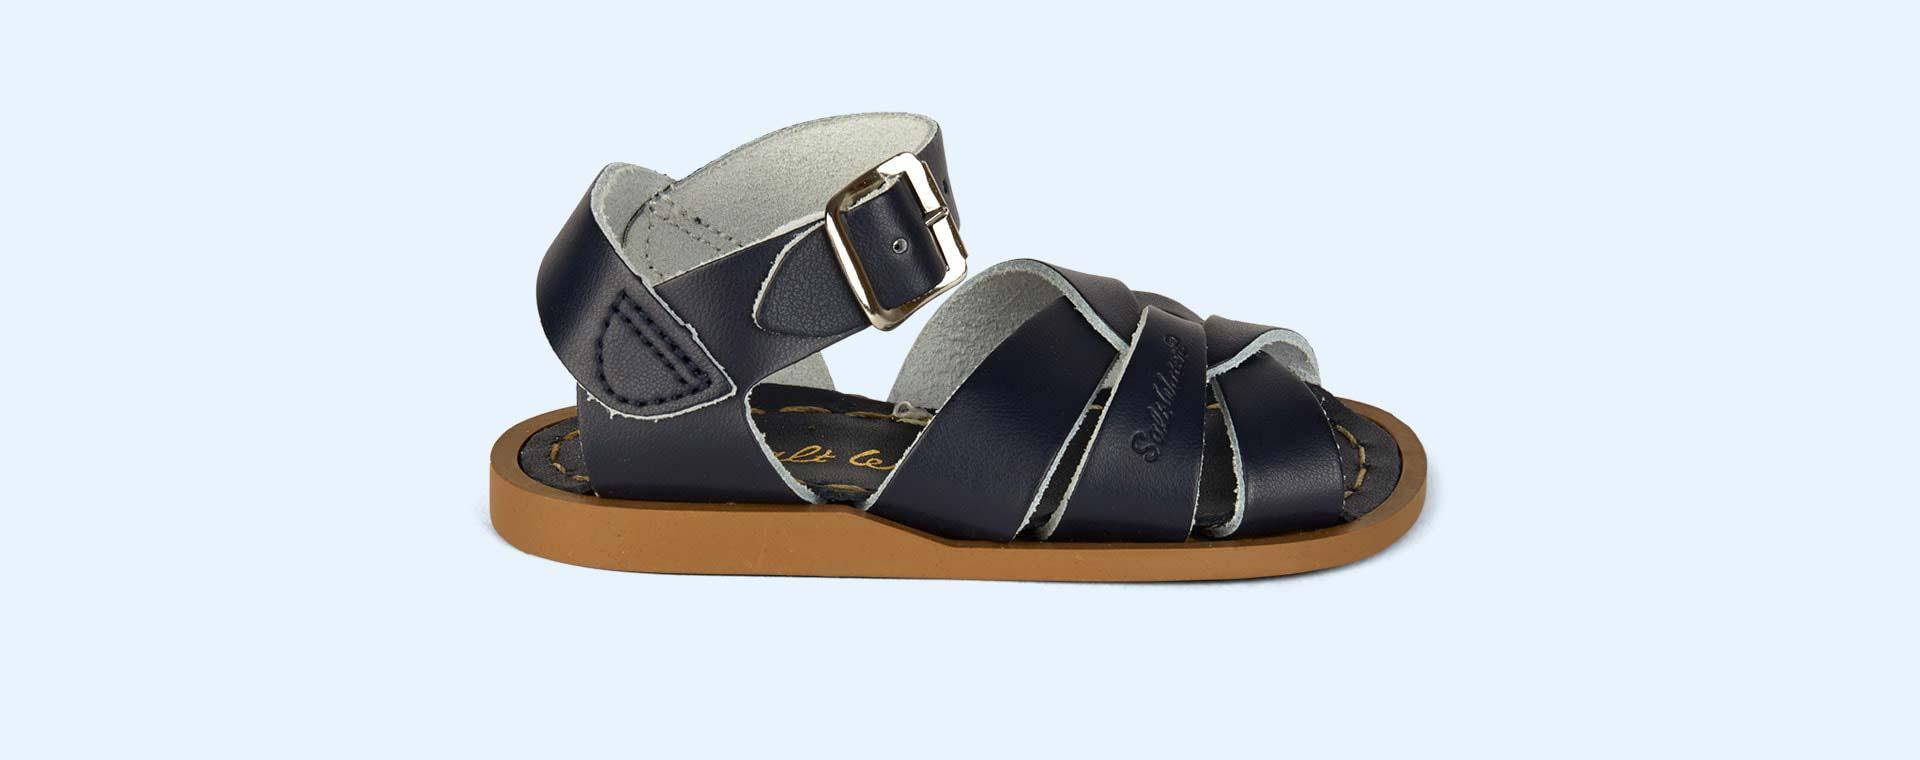 Navy Salt-Water Sandals The Original Salt Water Sandal